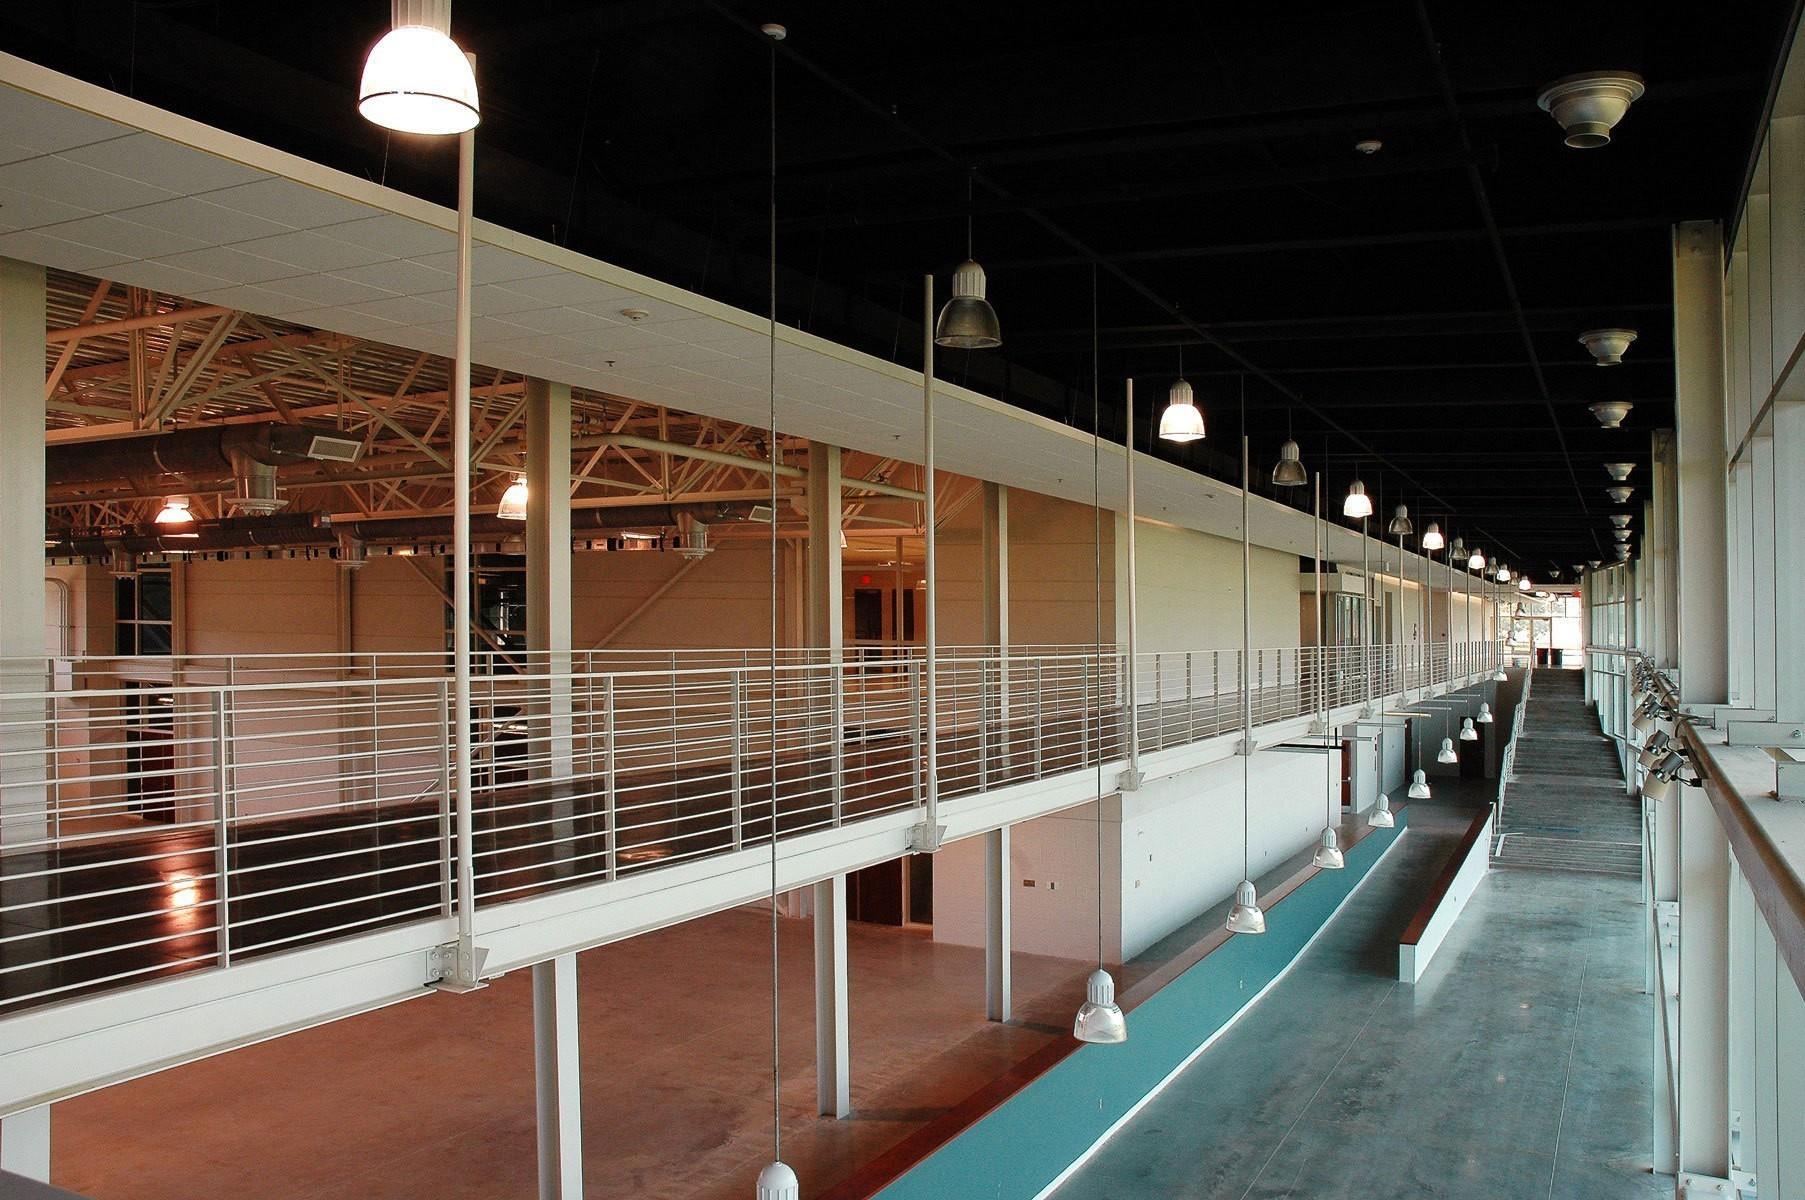 kia-training-center-interior-hallway